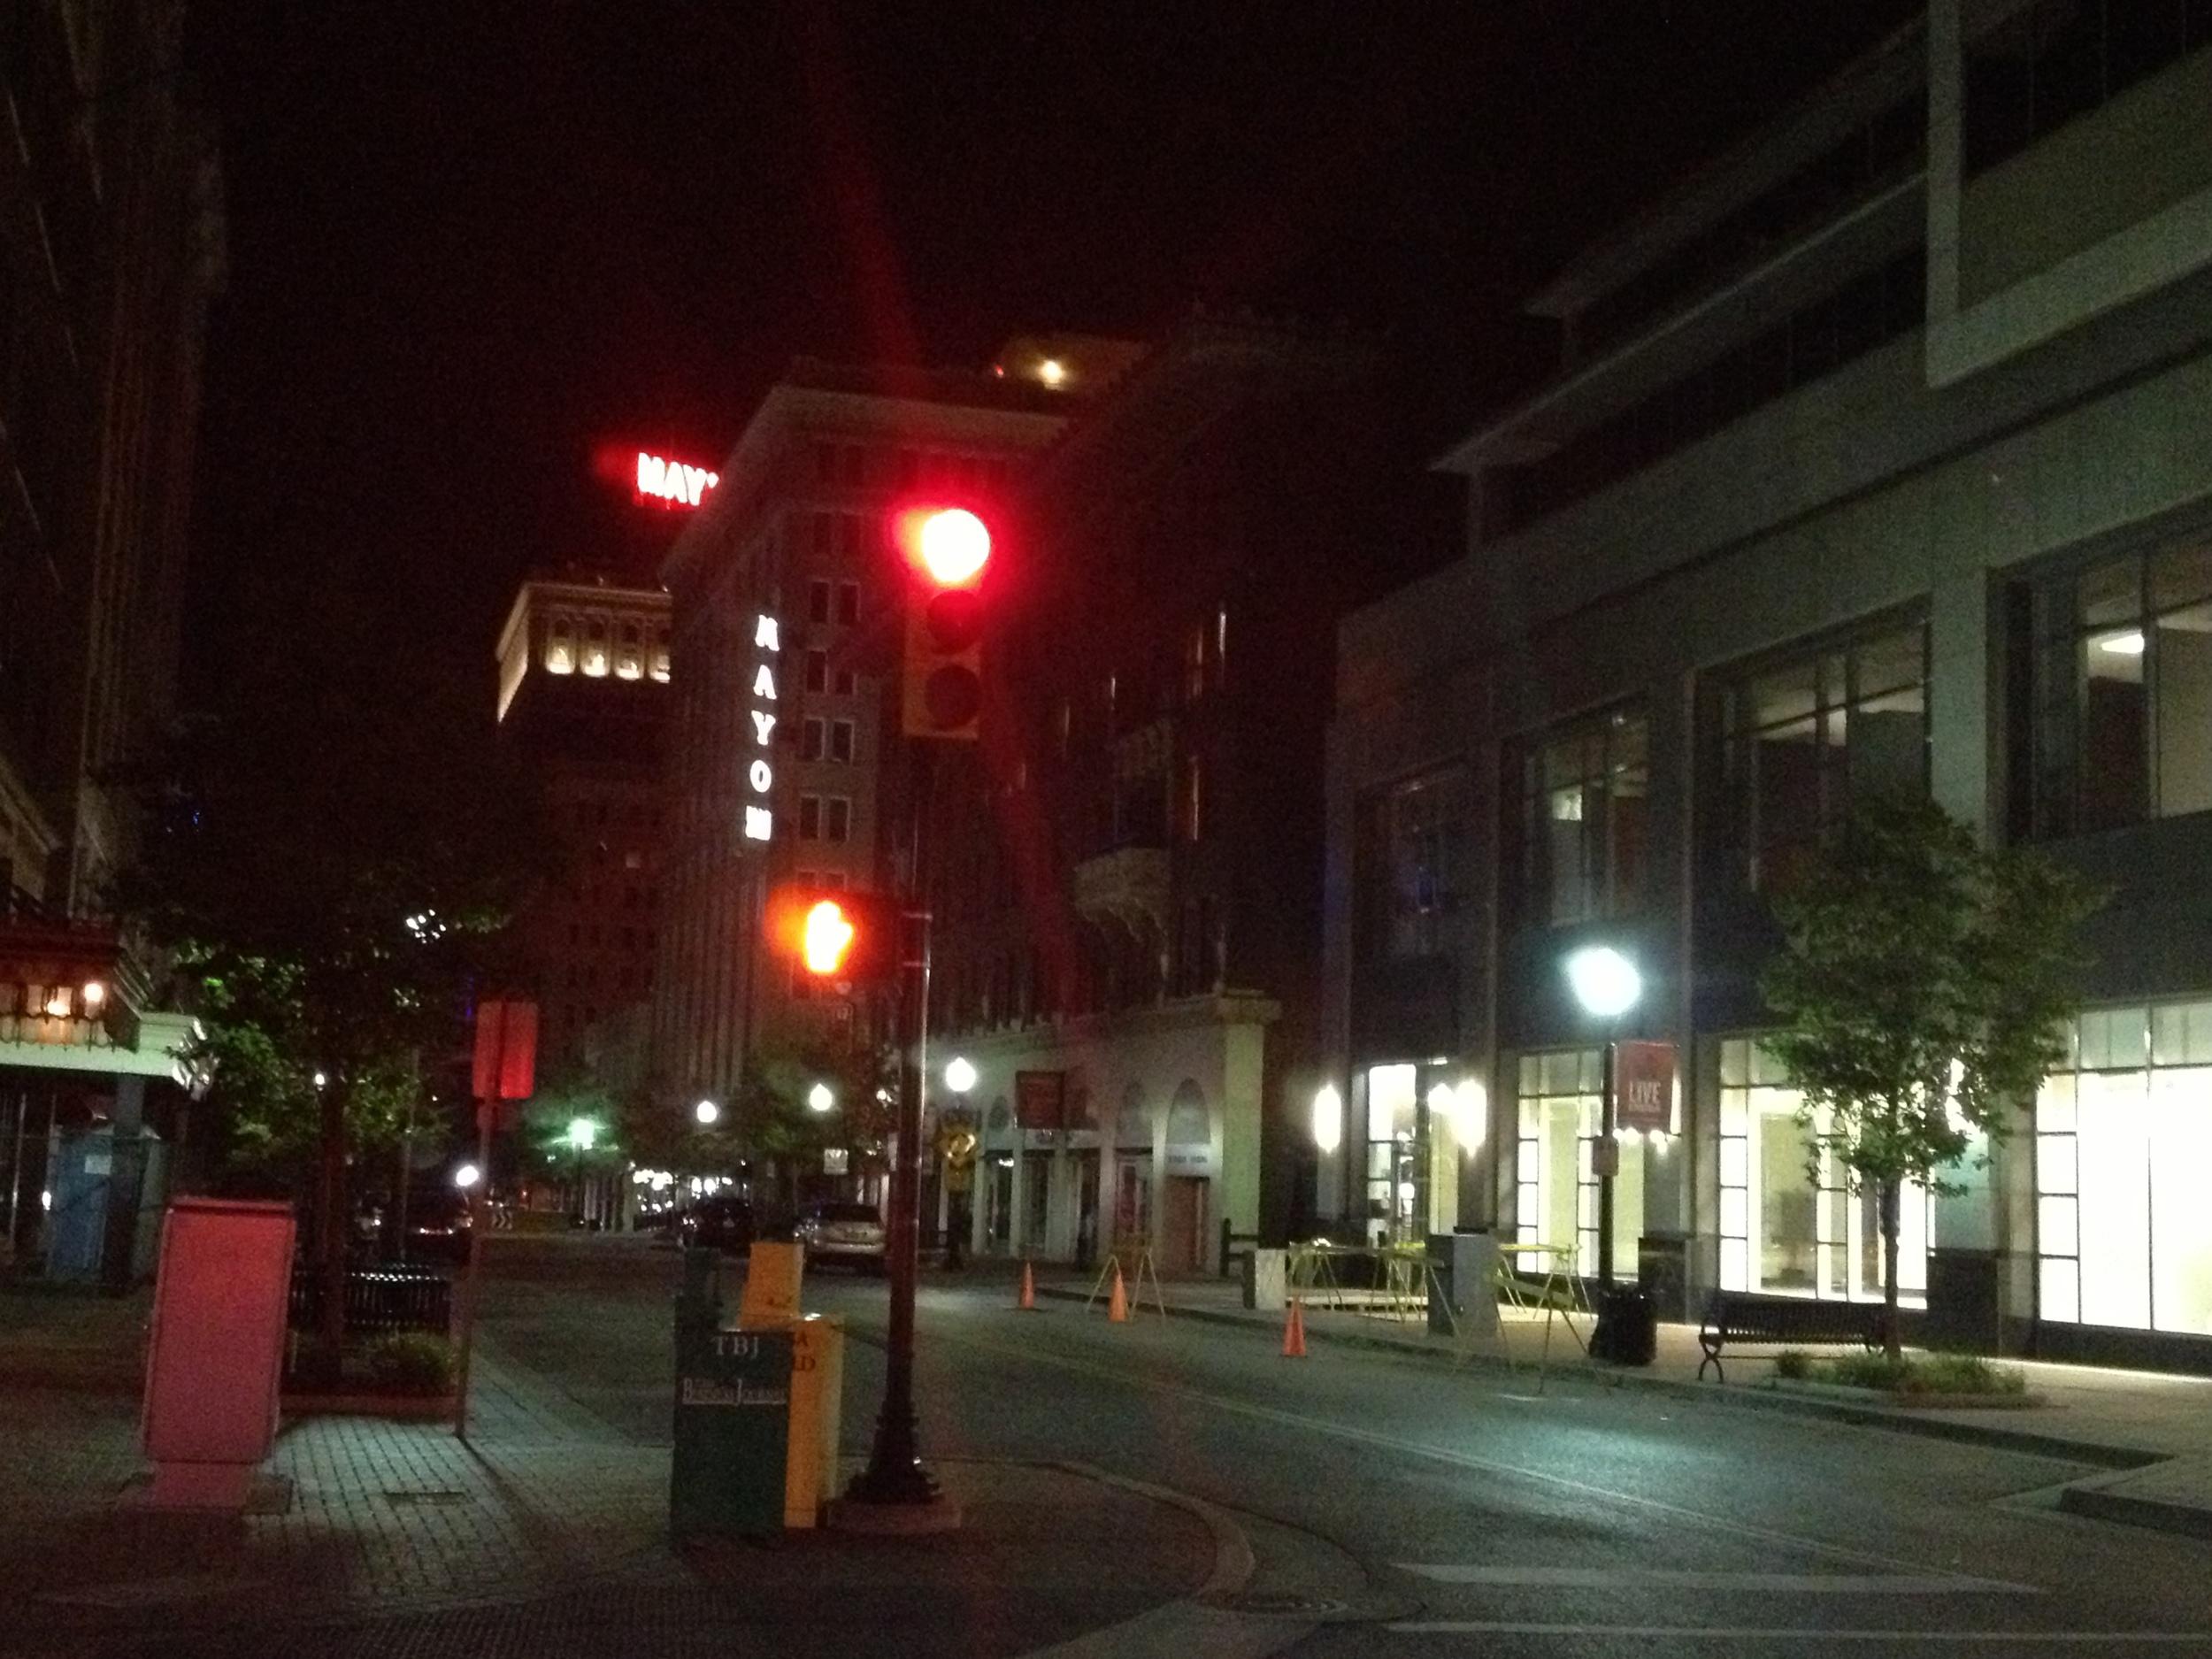 Downtown Streets of Tulsatu